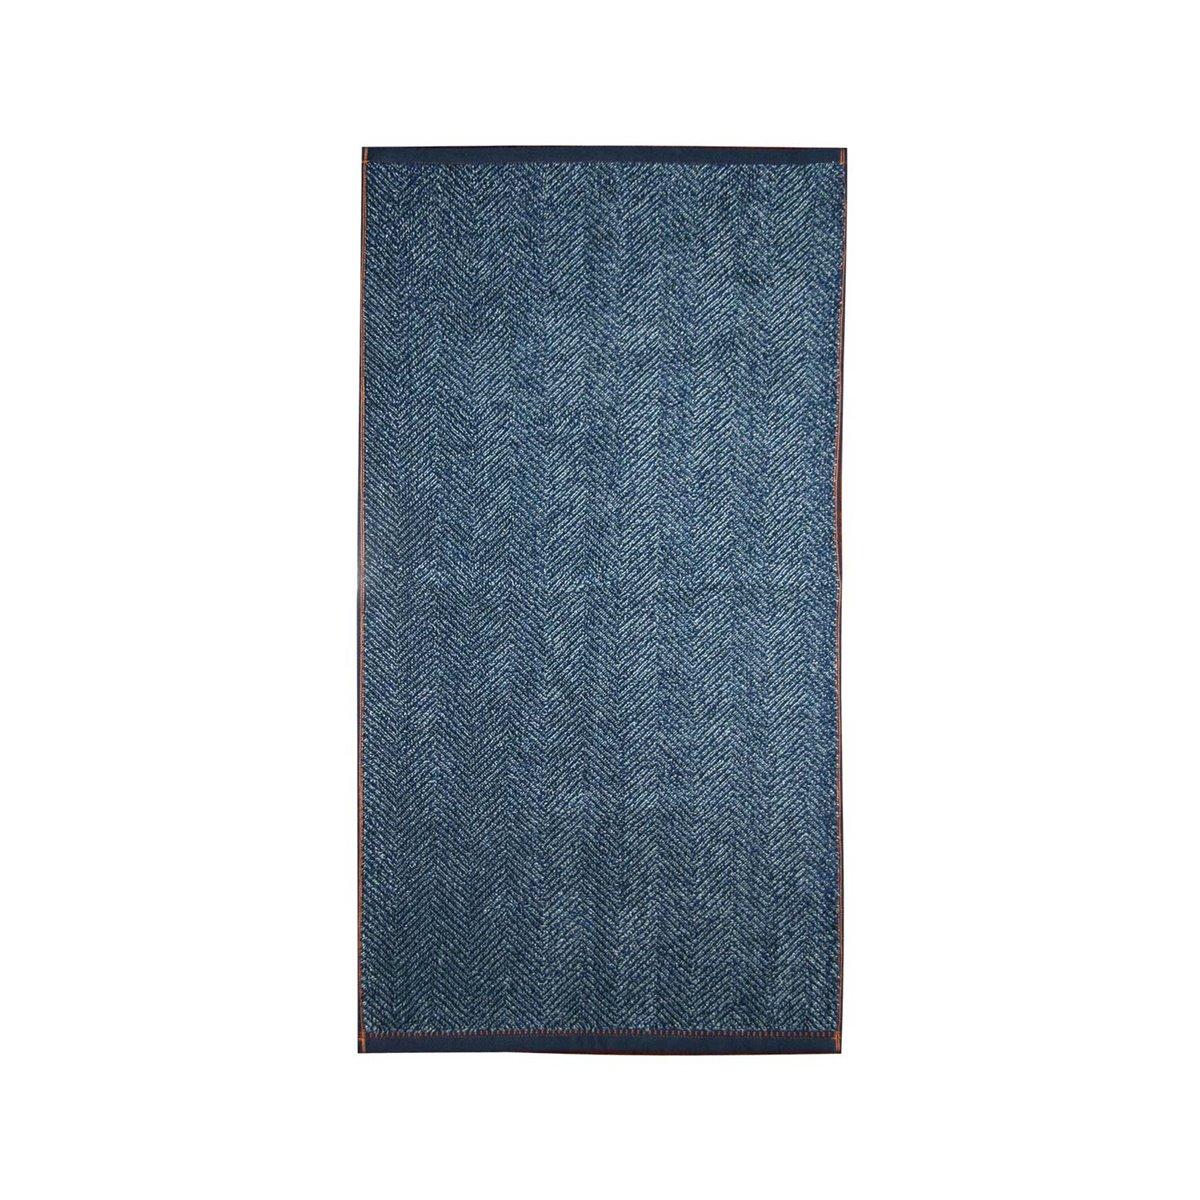 CASUAL - Drap de bain 550gr/m²  Denim 70x140 cm